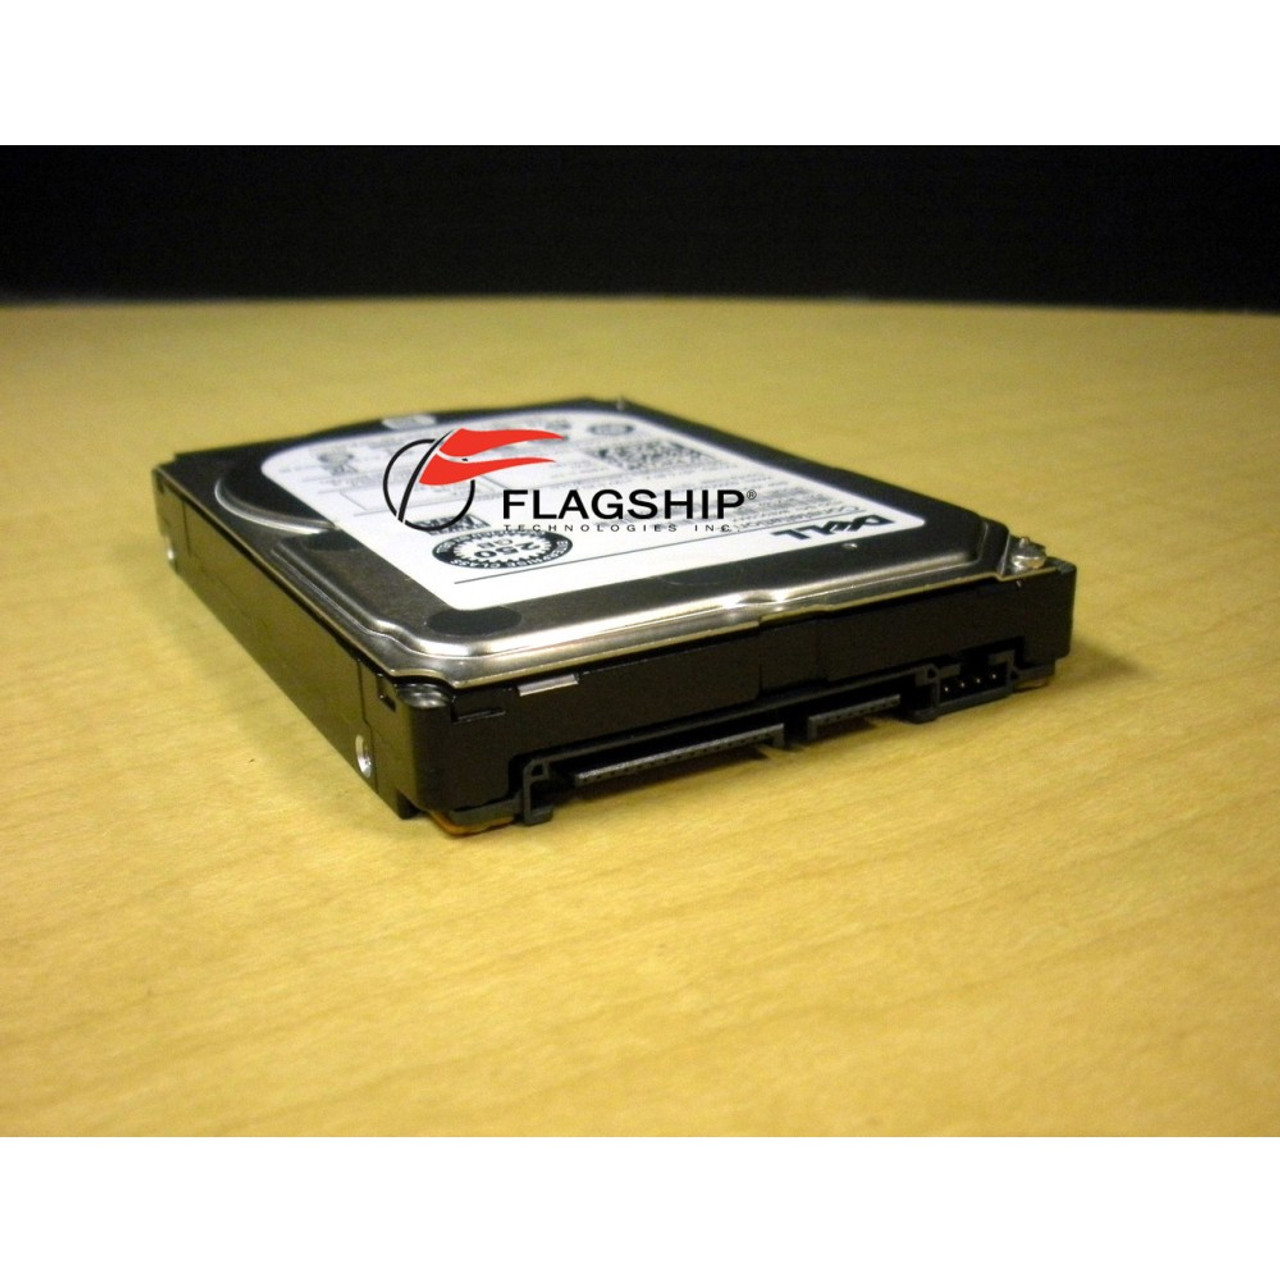 DELL PowerEdge R810 3TB 6GB//s SAS 7.2K 3.5 Hard Drive